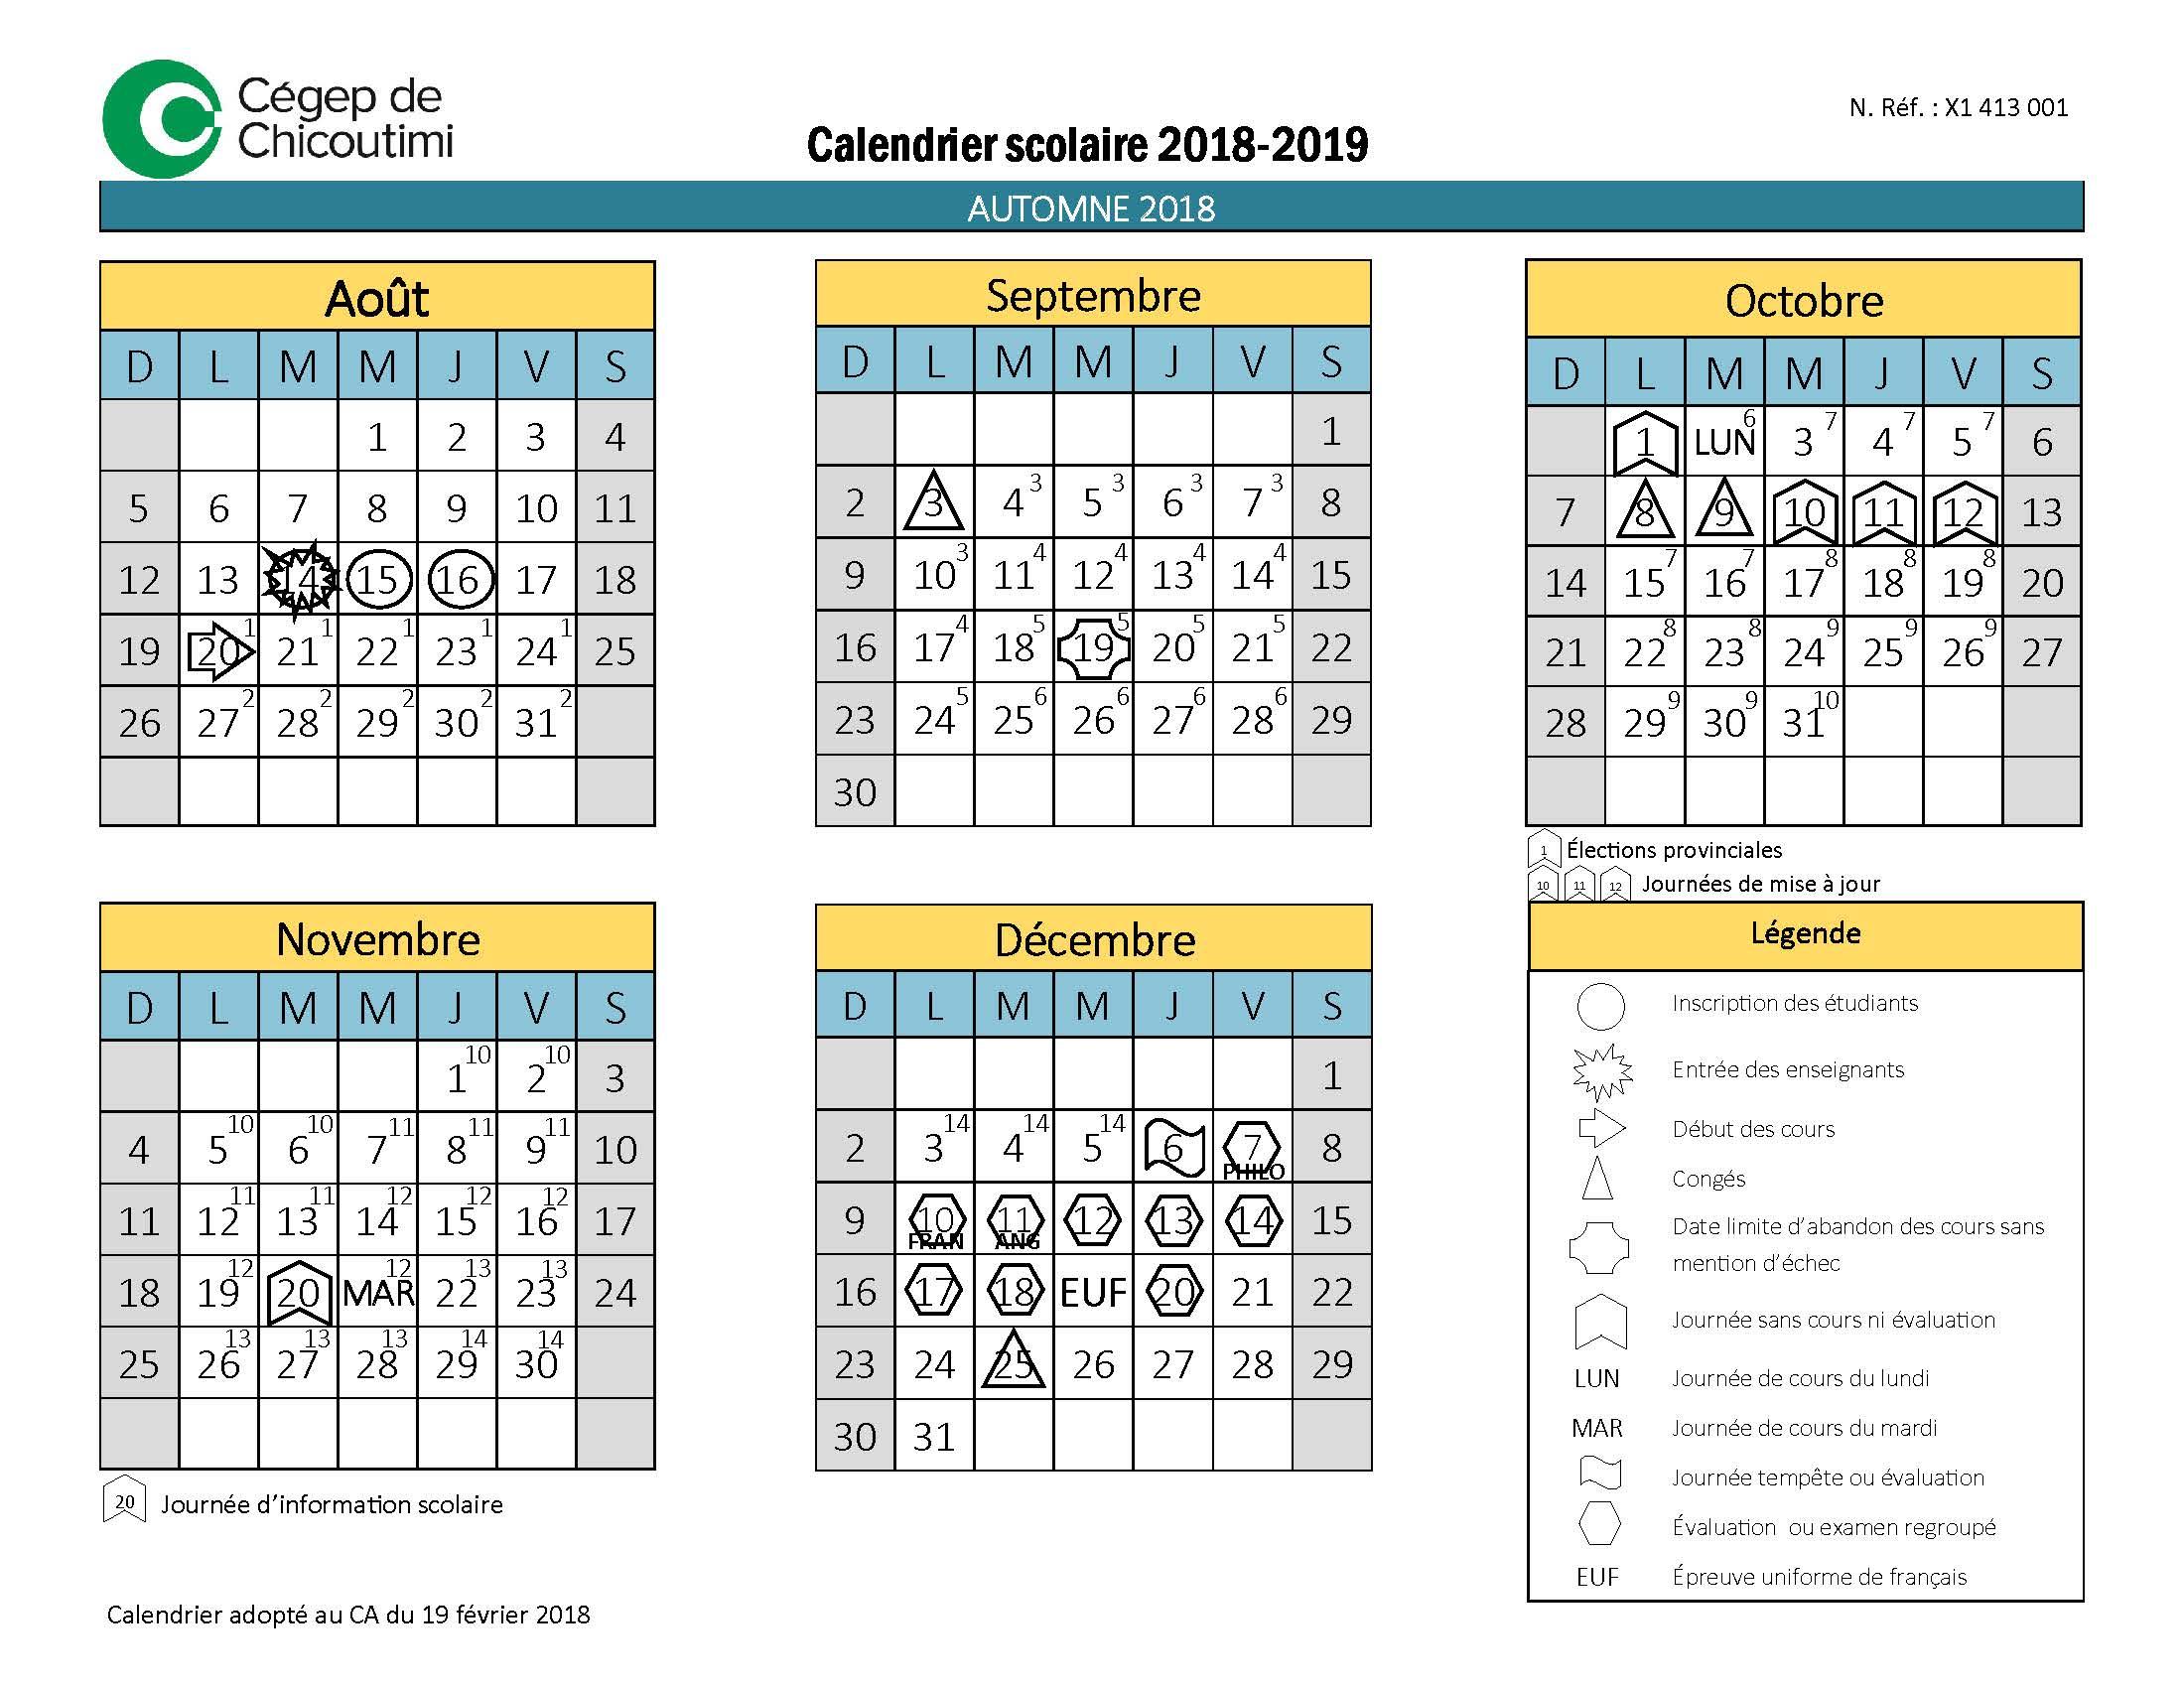 Calendrier scolaire - Cegep de Chicoutimi - 2018-2019_Page_1